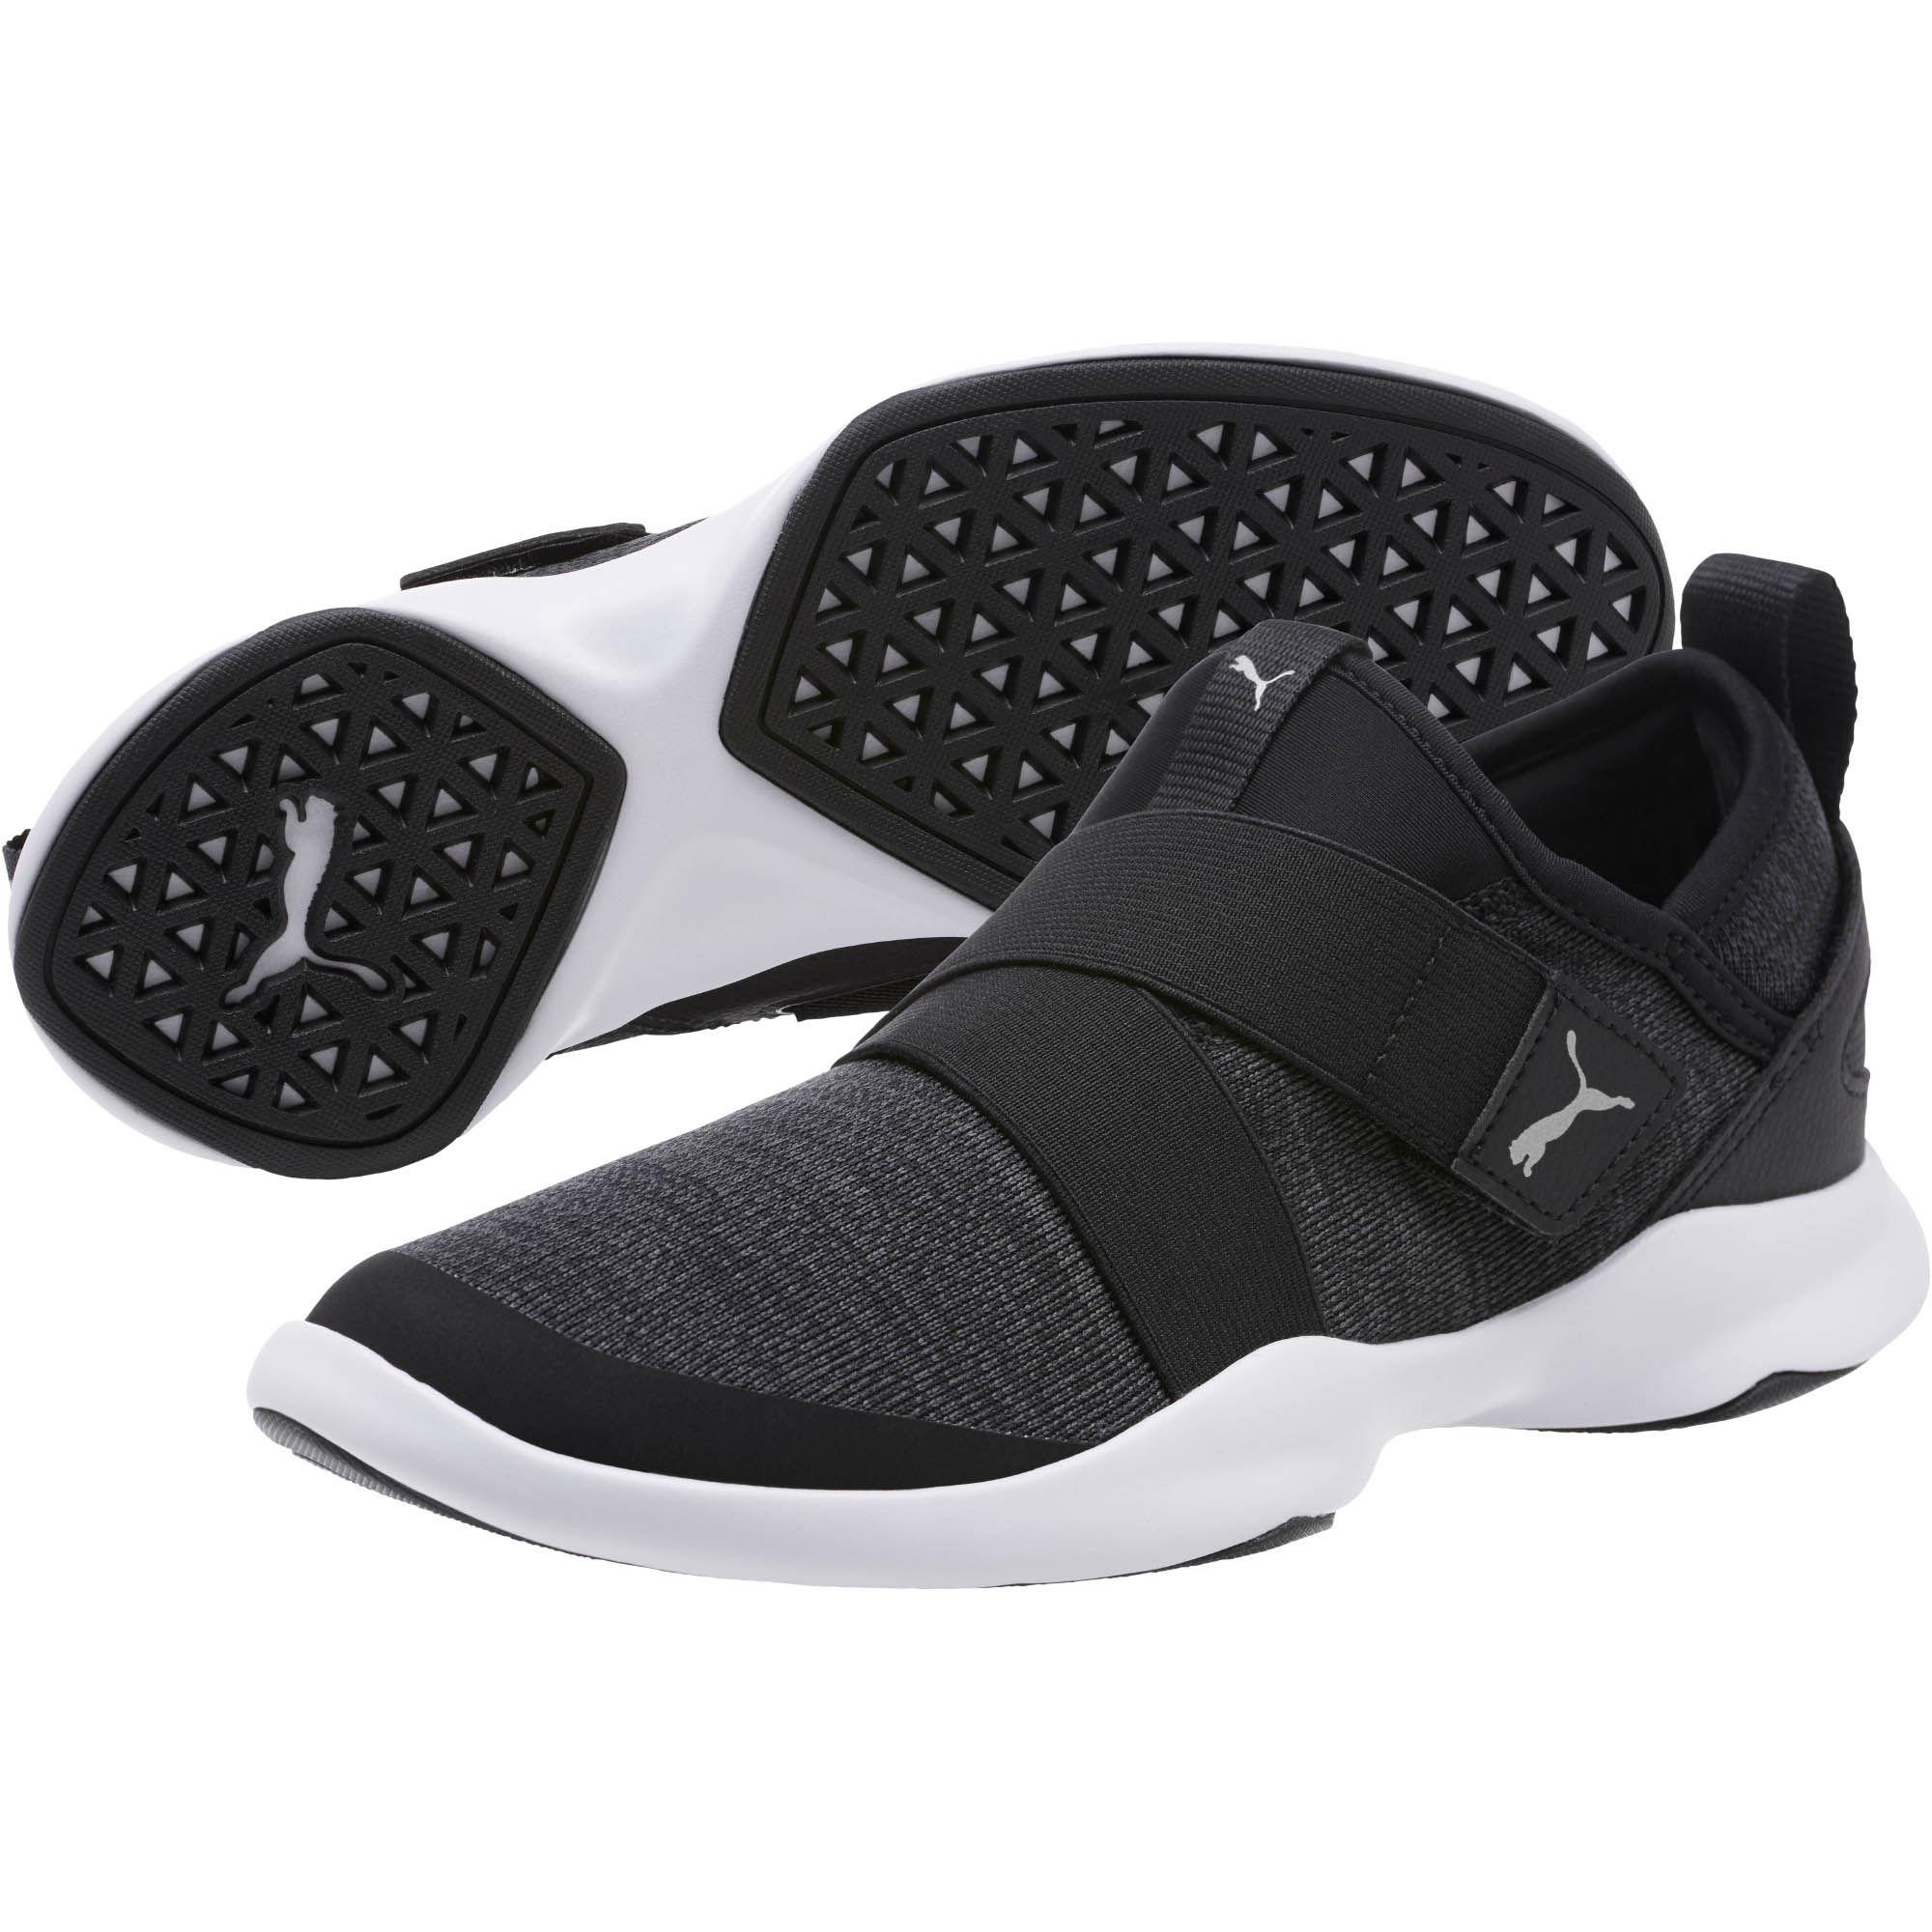 Lyst - PUMA Dare Ac Sneakers in Black for Men 6ffb60516